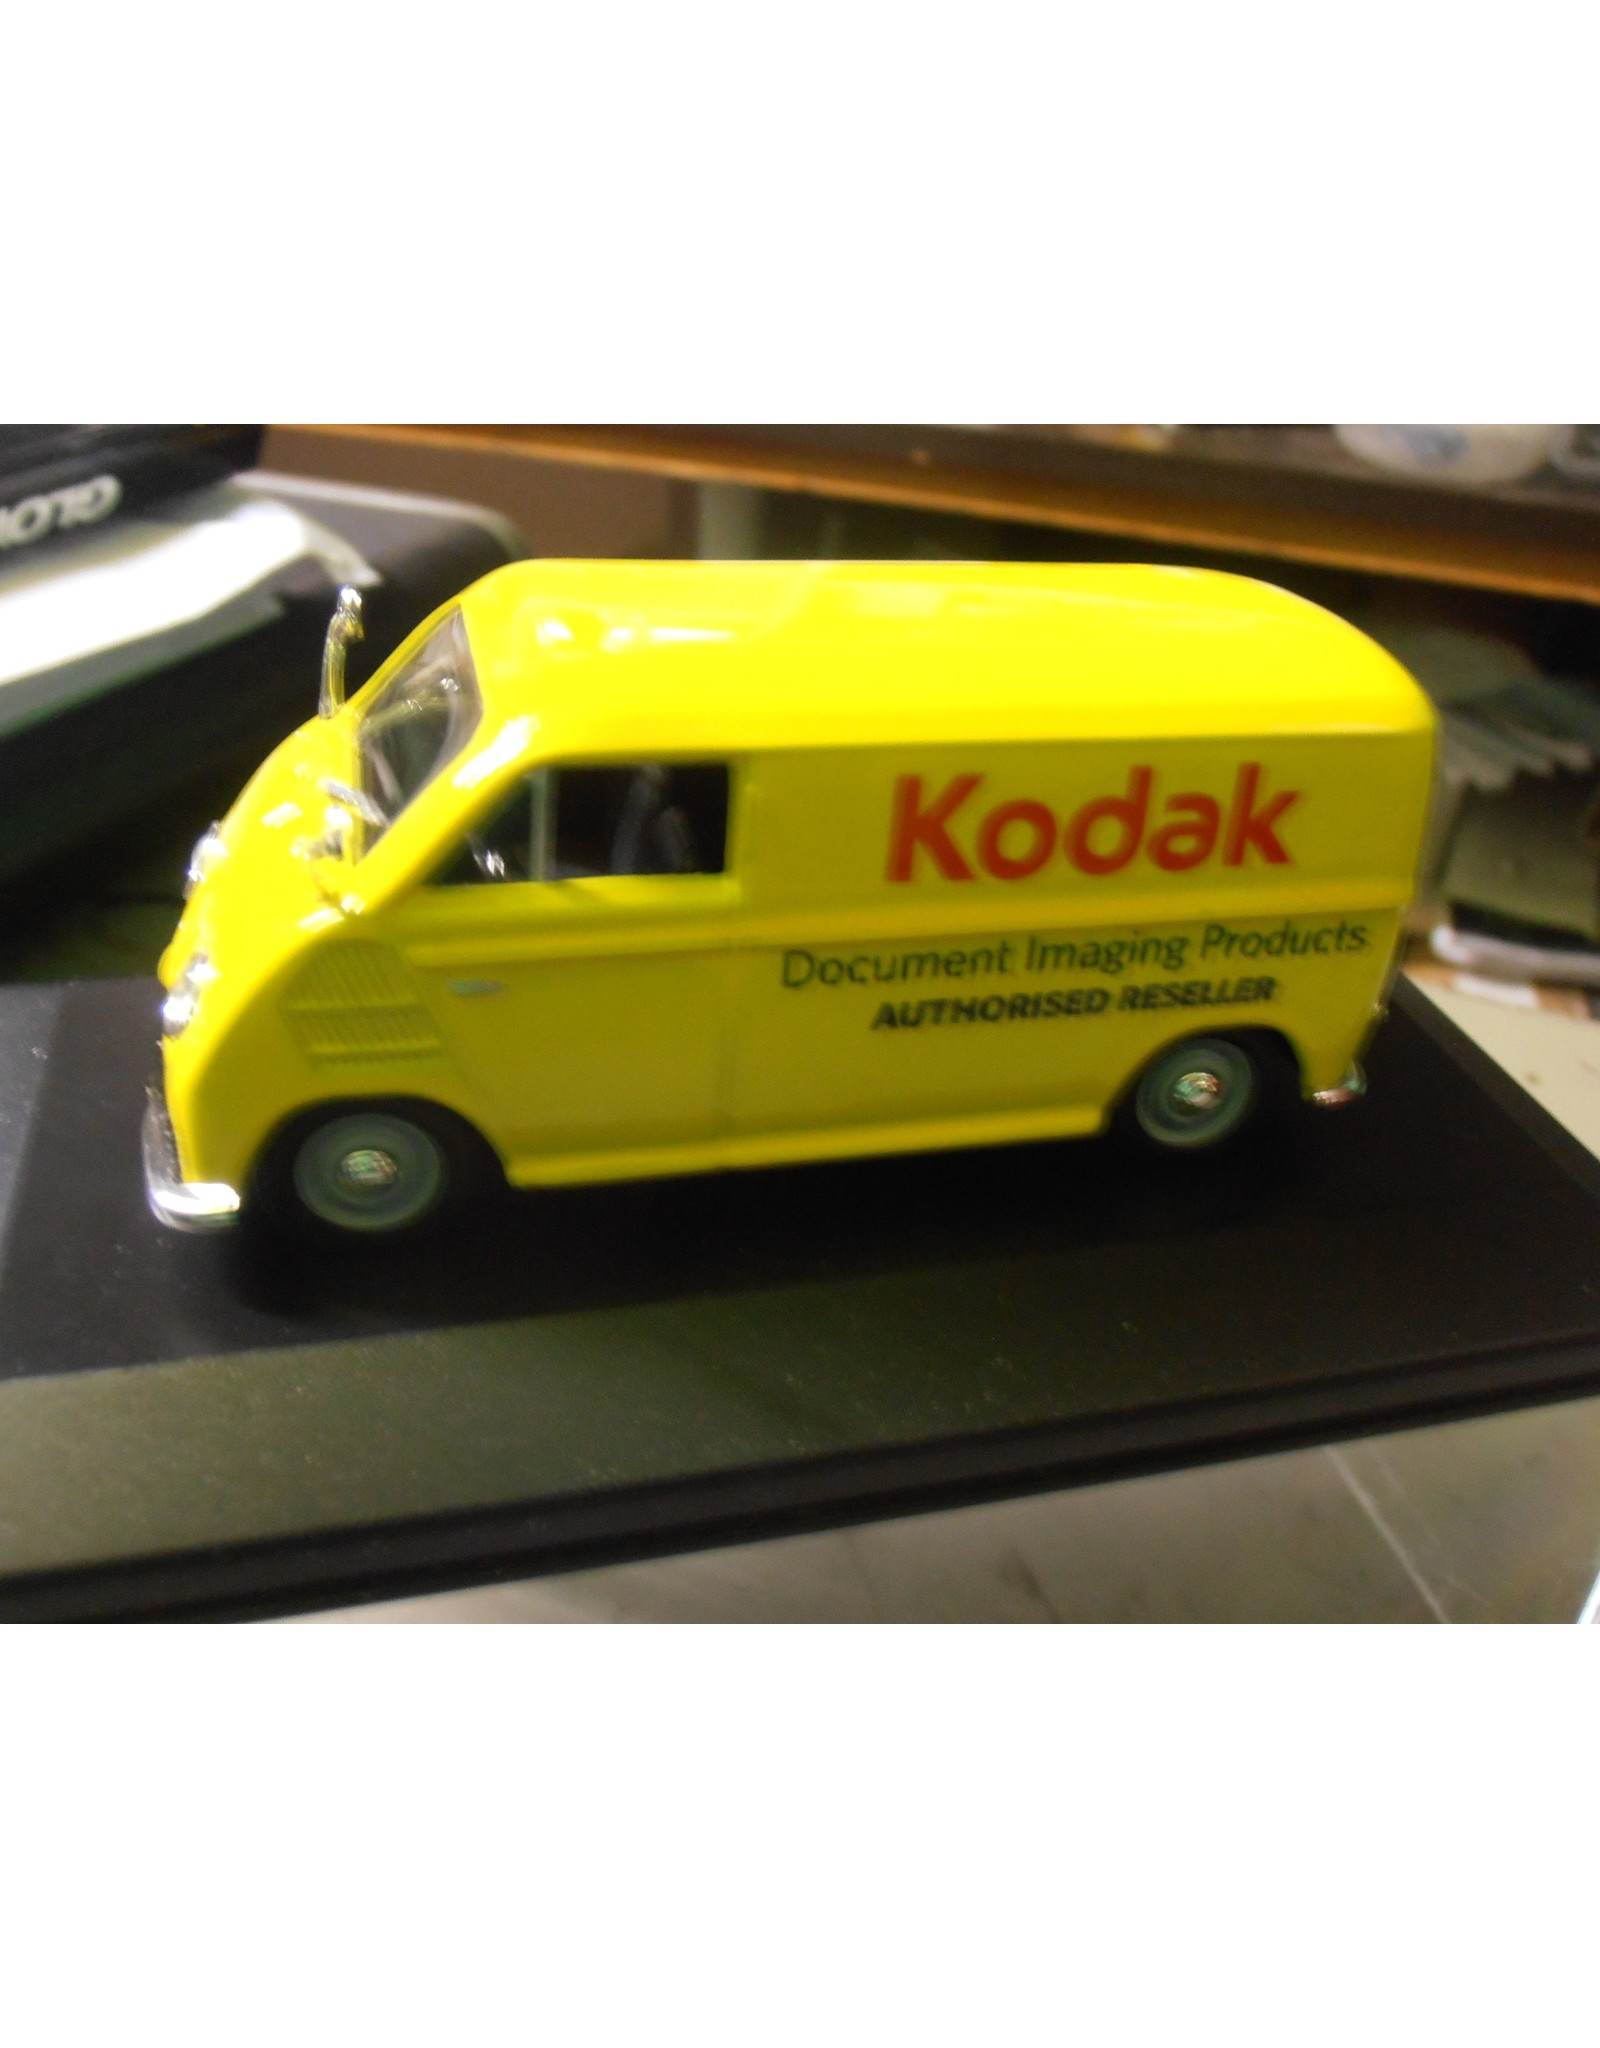 "DKW DKW 3=6 F800 KODAK"""""